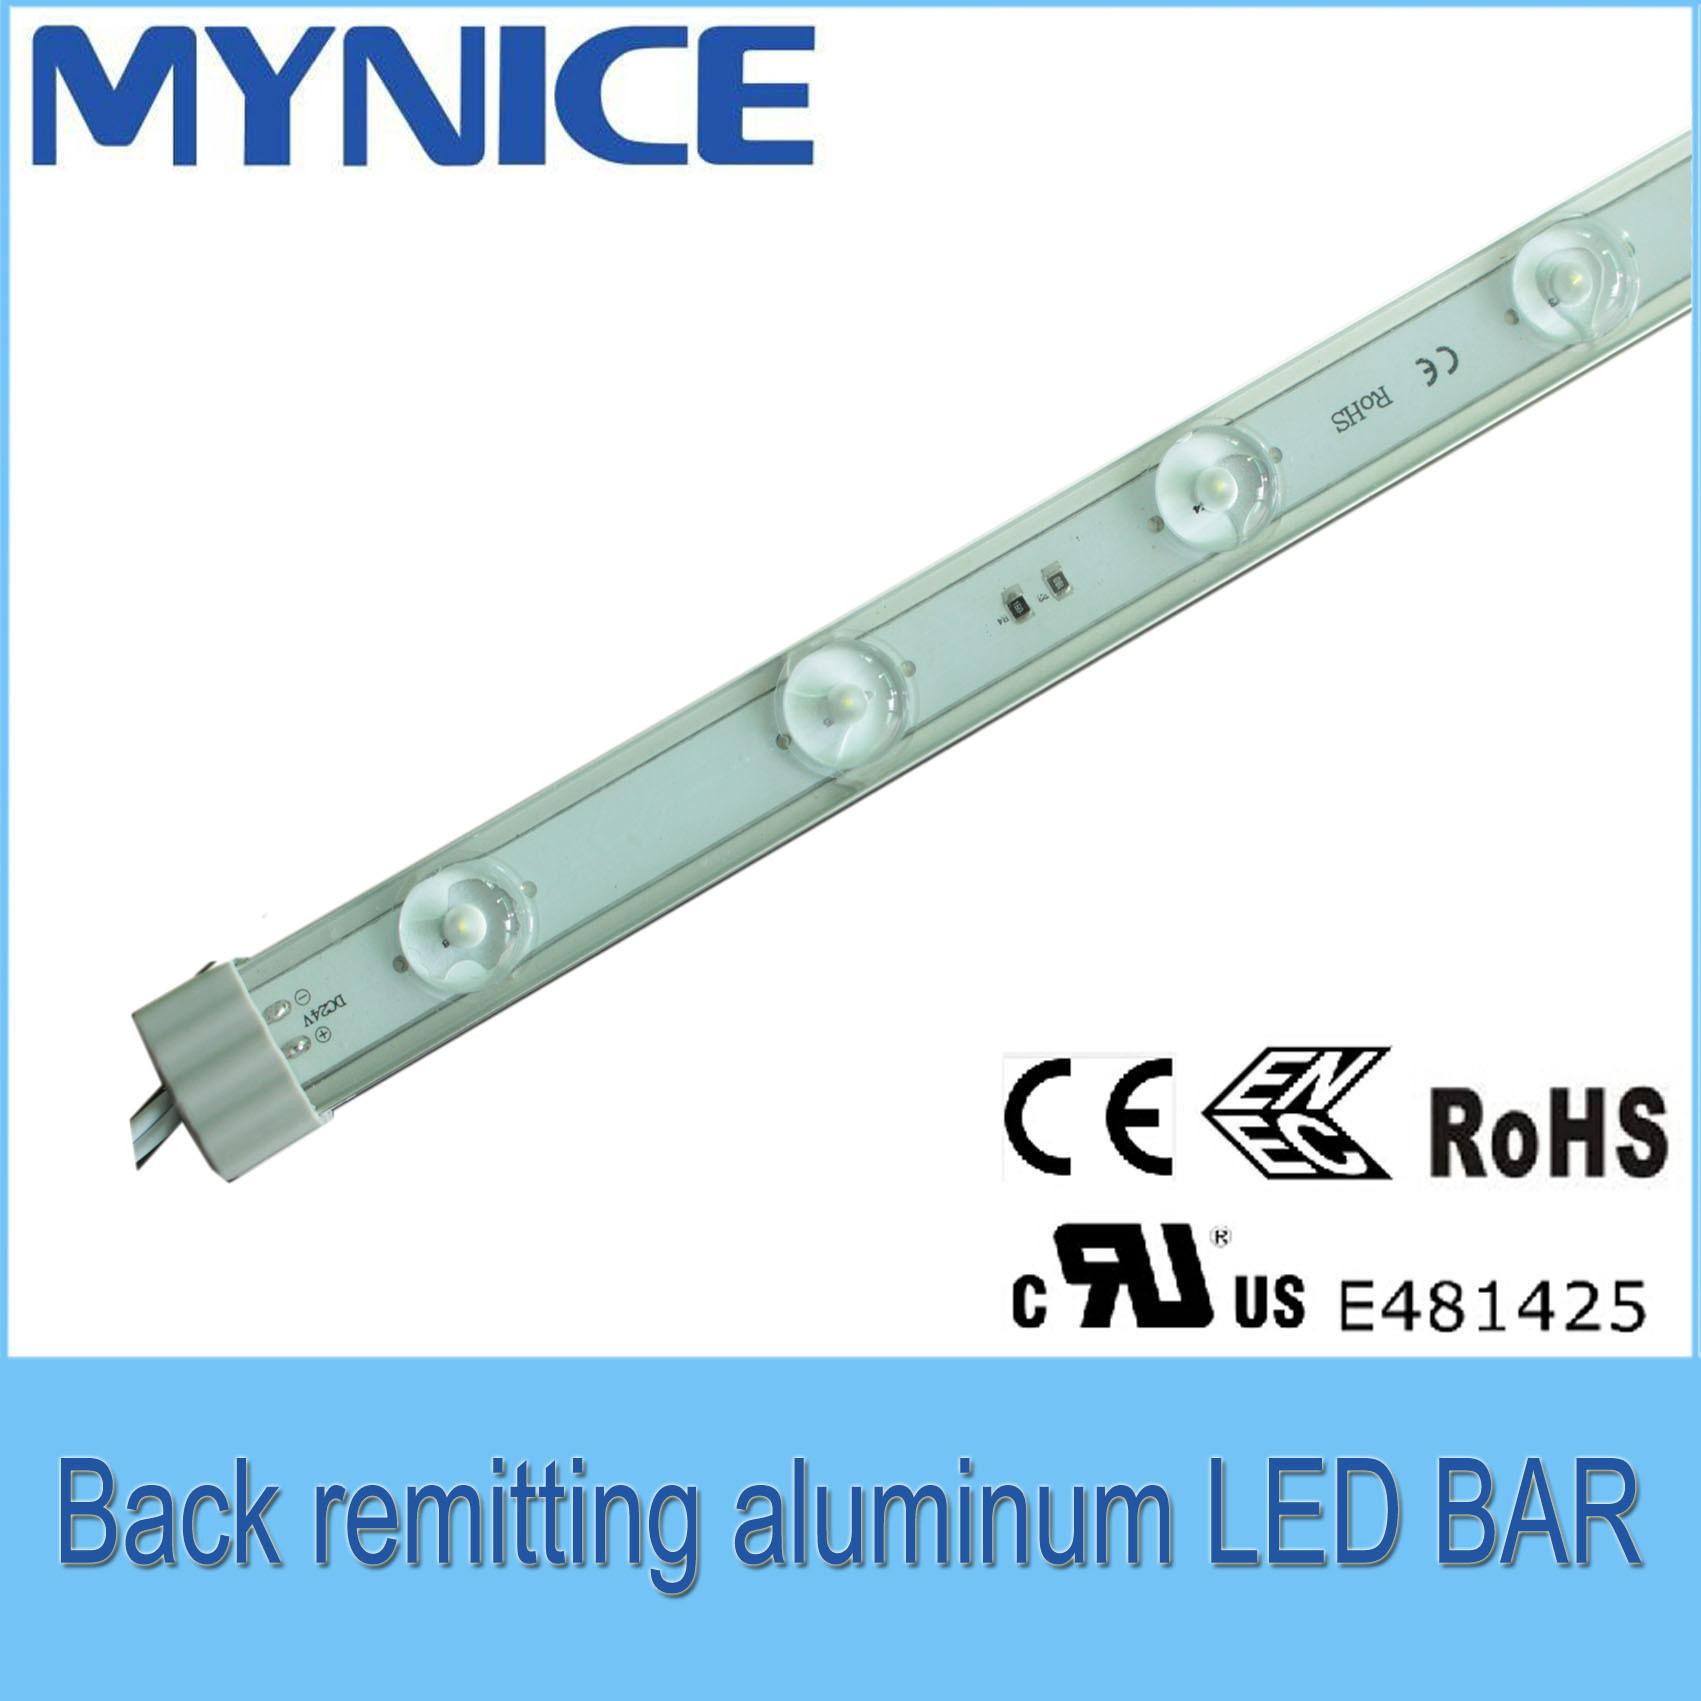 DC24V Back Remitting Aluminum LED Rigid Bar for Advertising Box